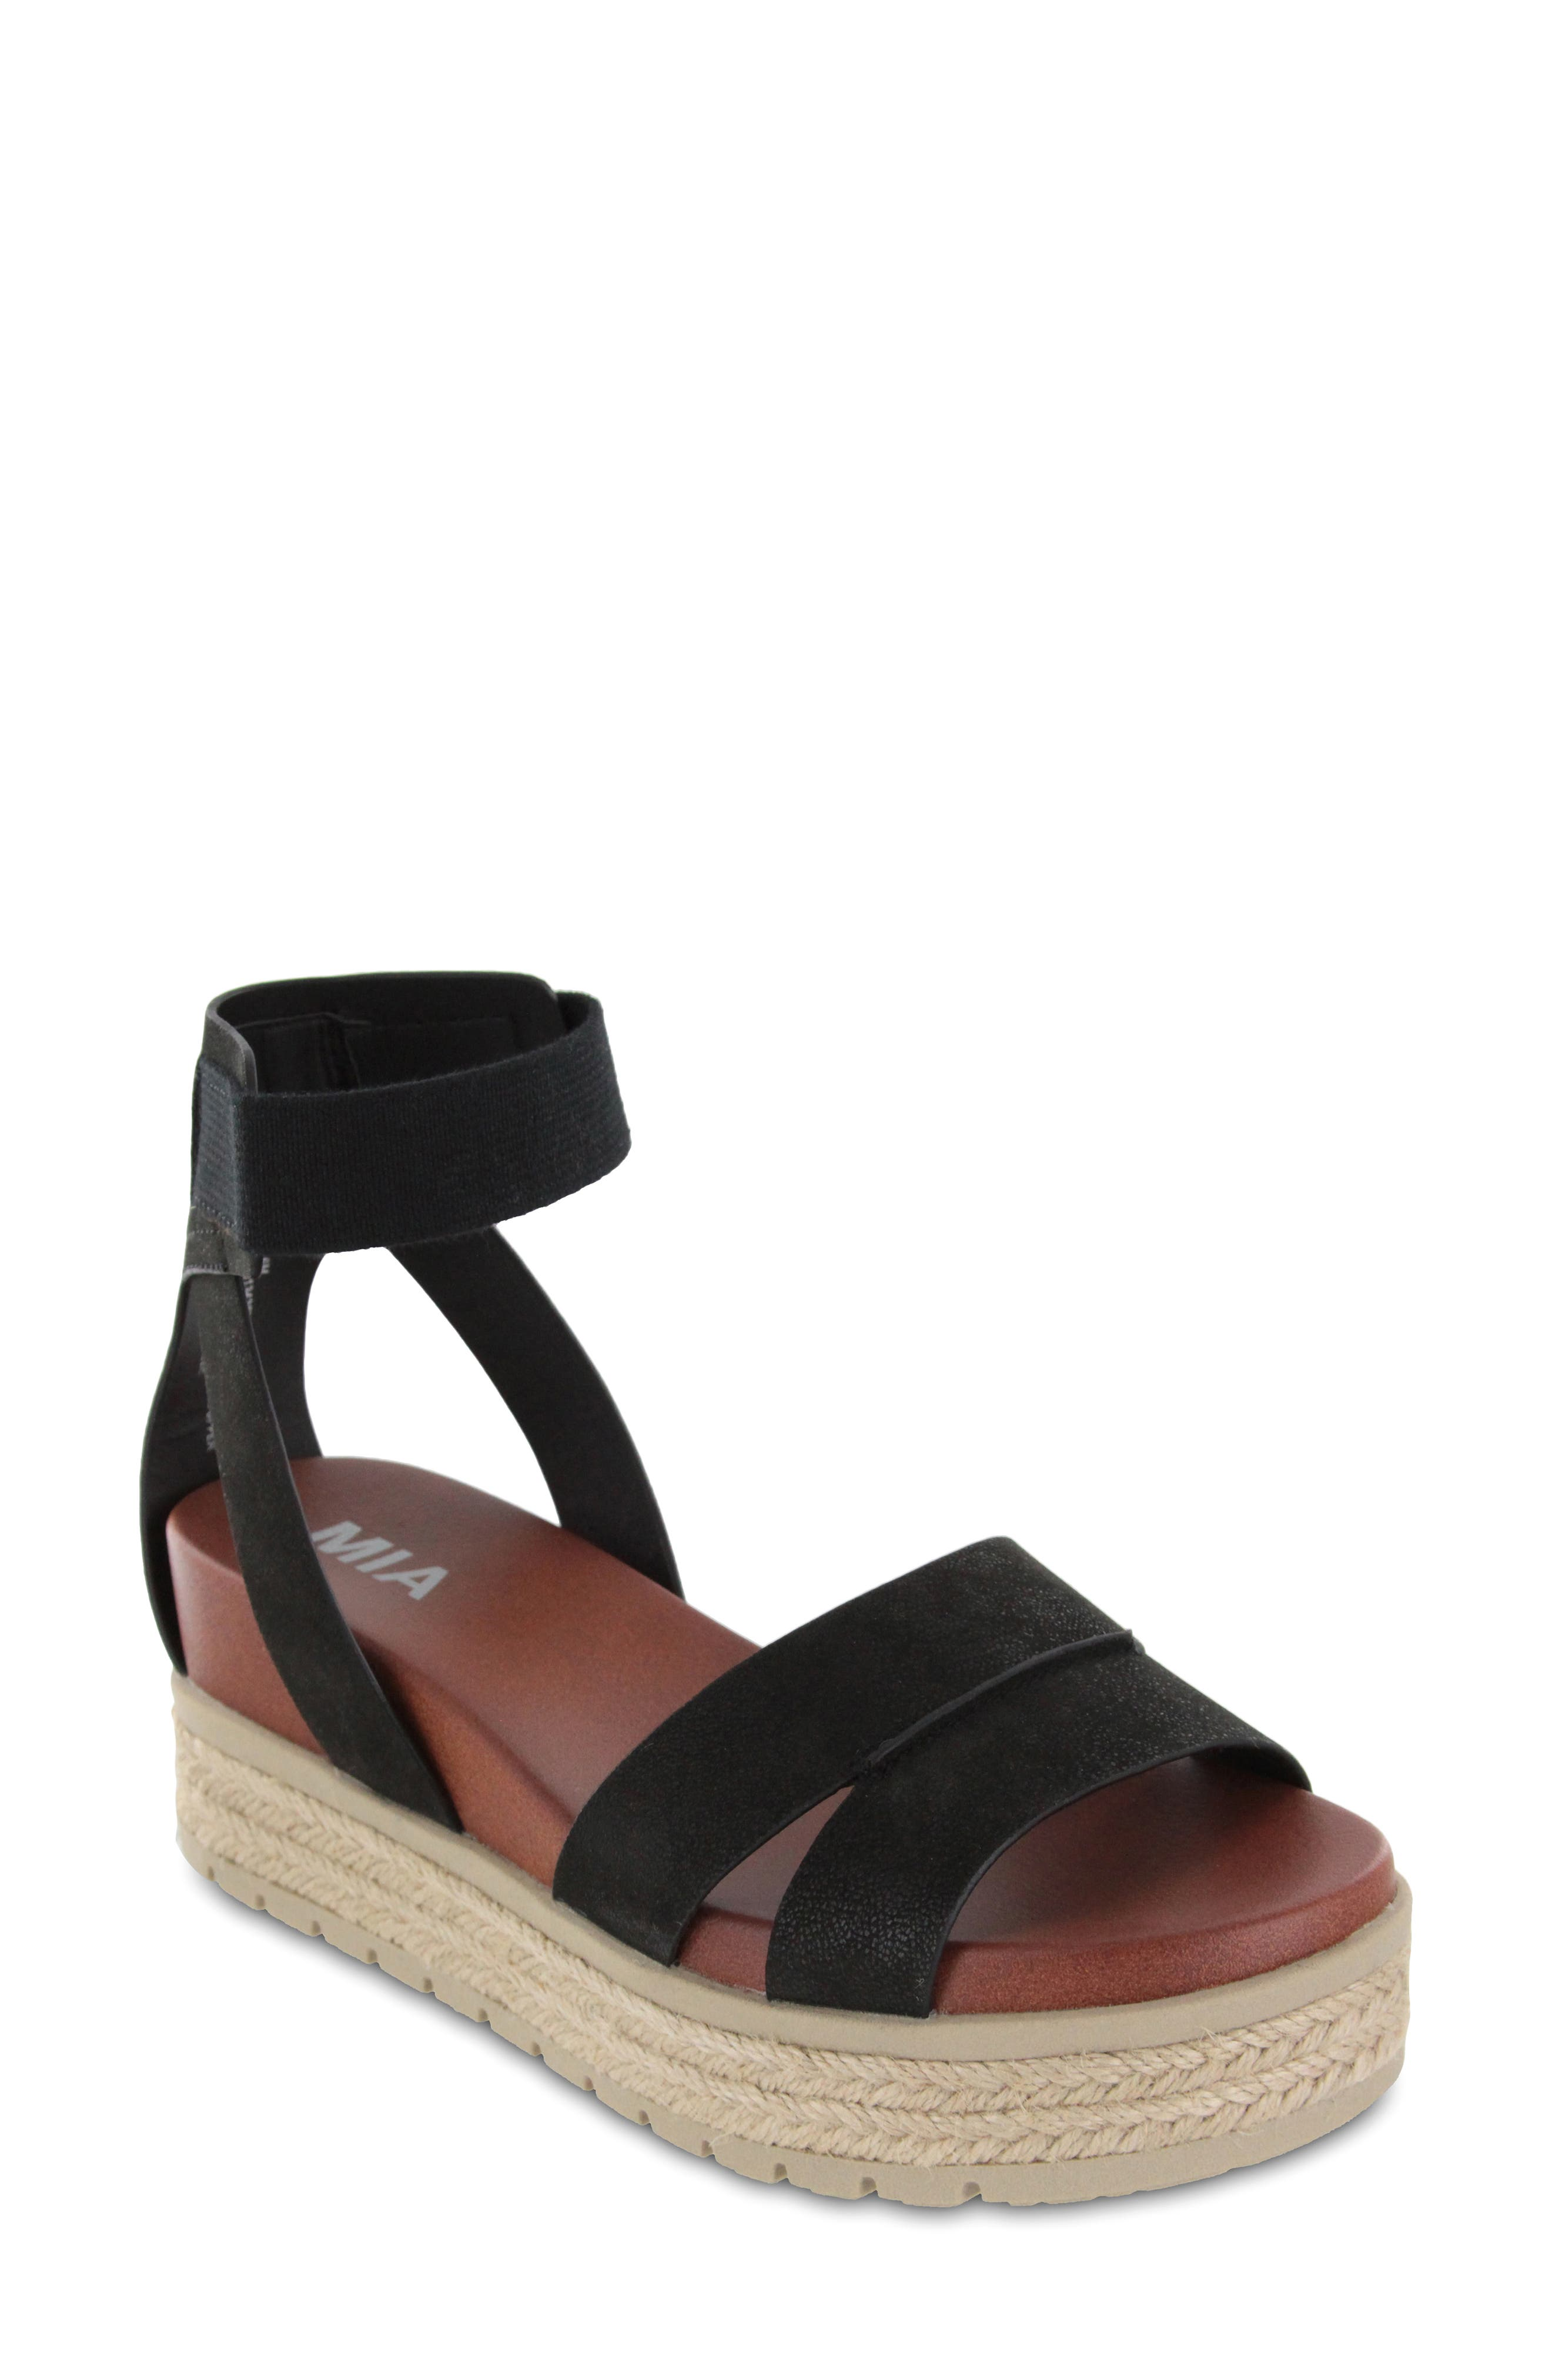 Kaylyn Platform Sandal